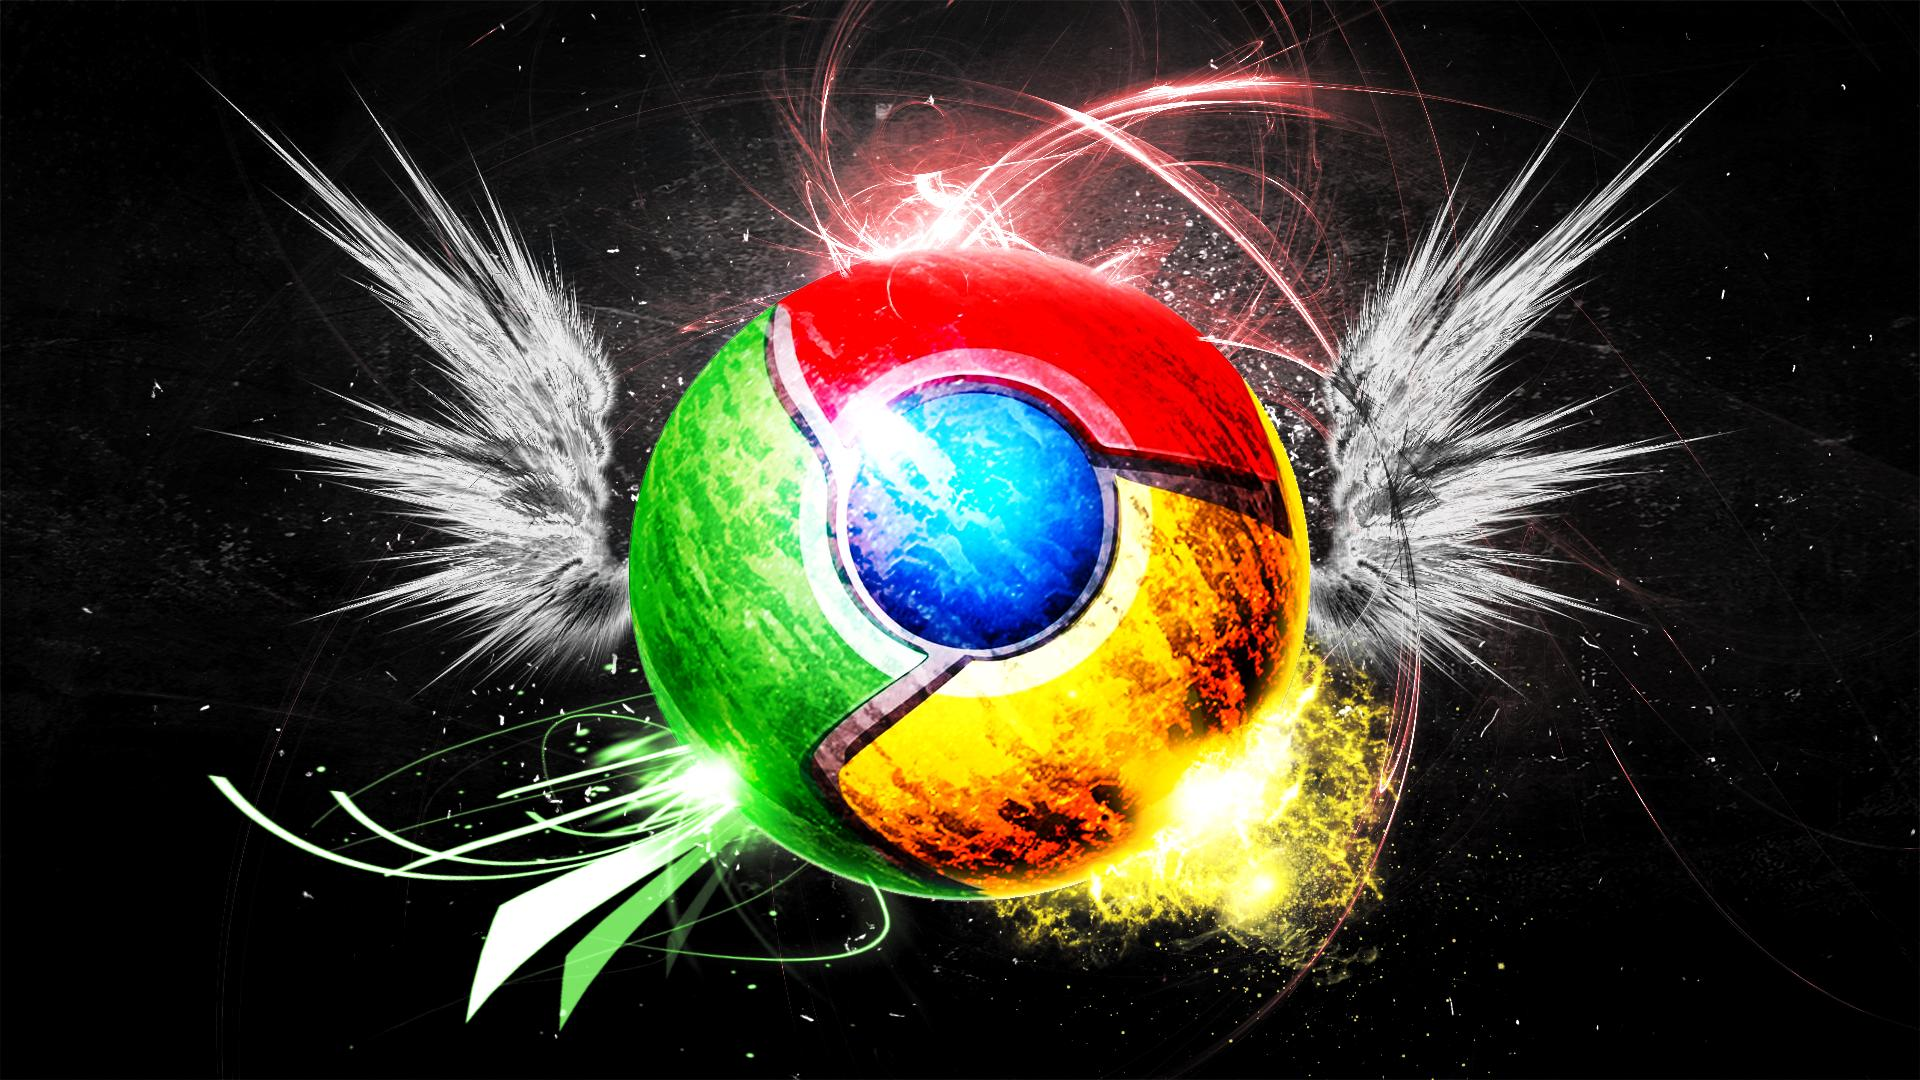 Chrome Wallpaper : Bhbr.info.